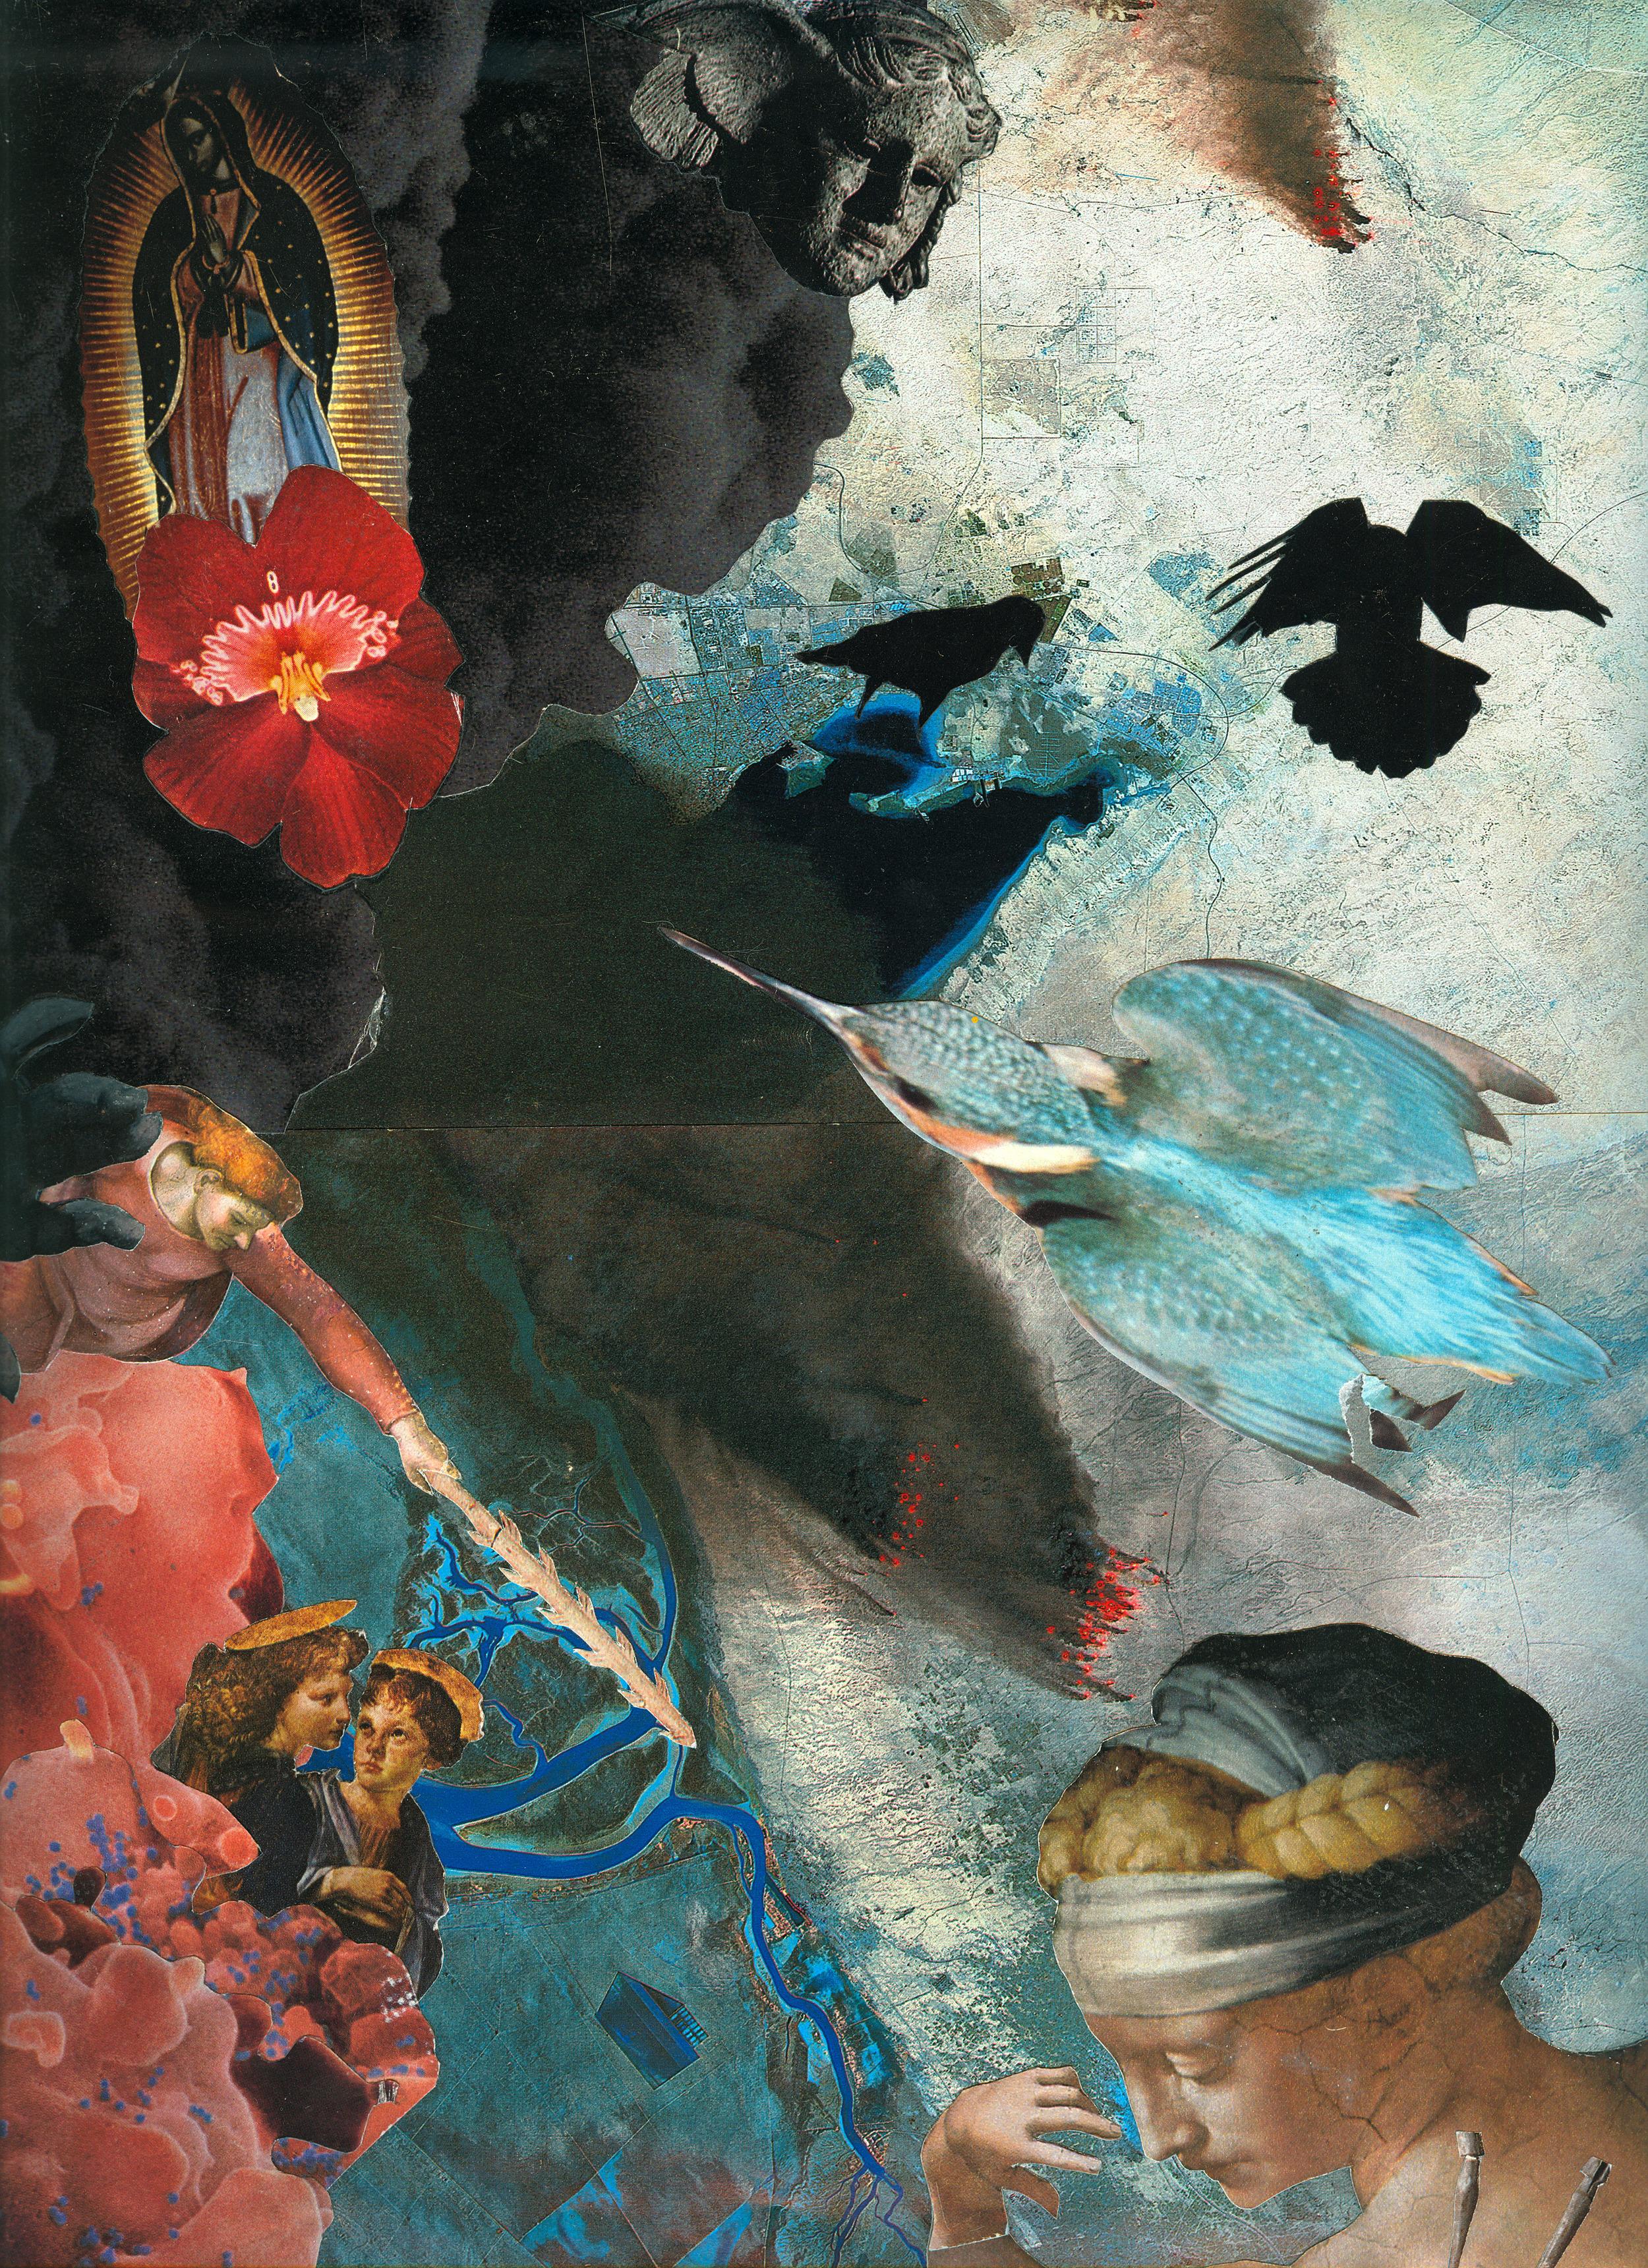 Agnieszka Sosnowska, Landing,Collage,1993